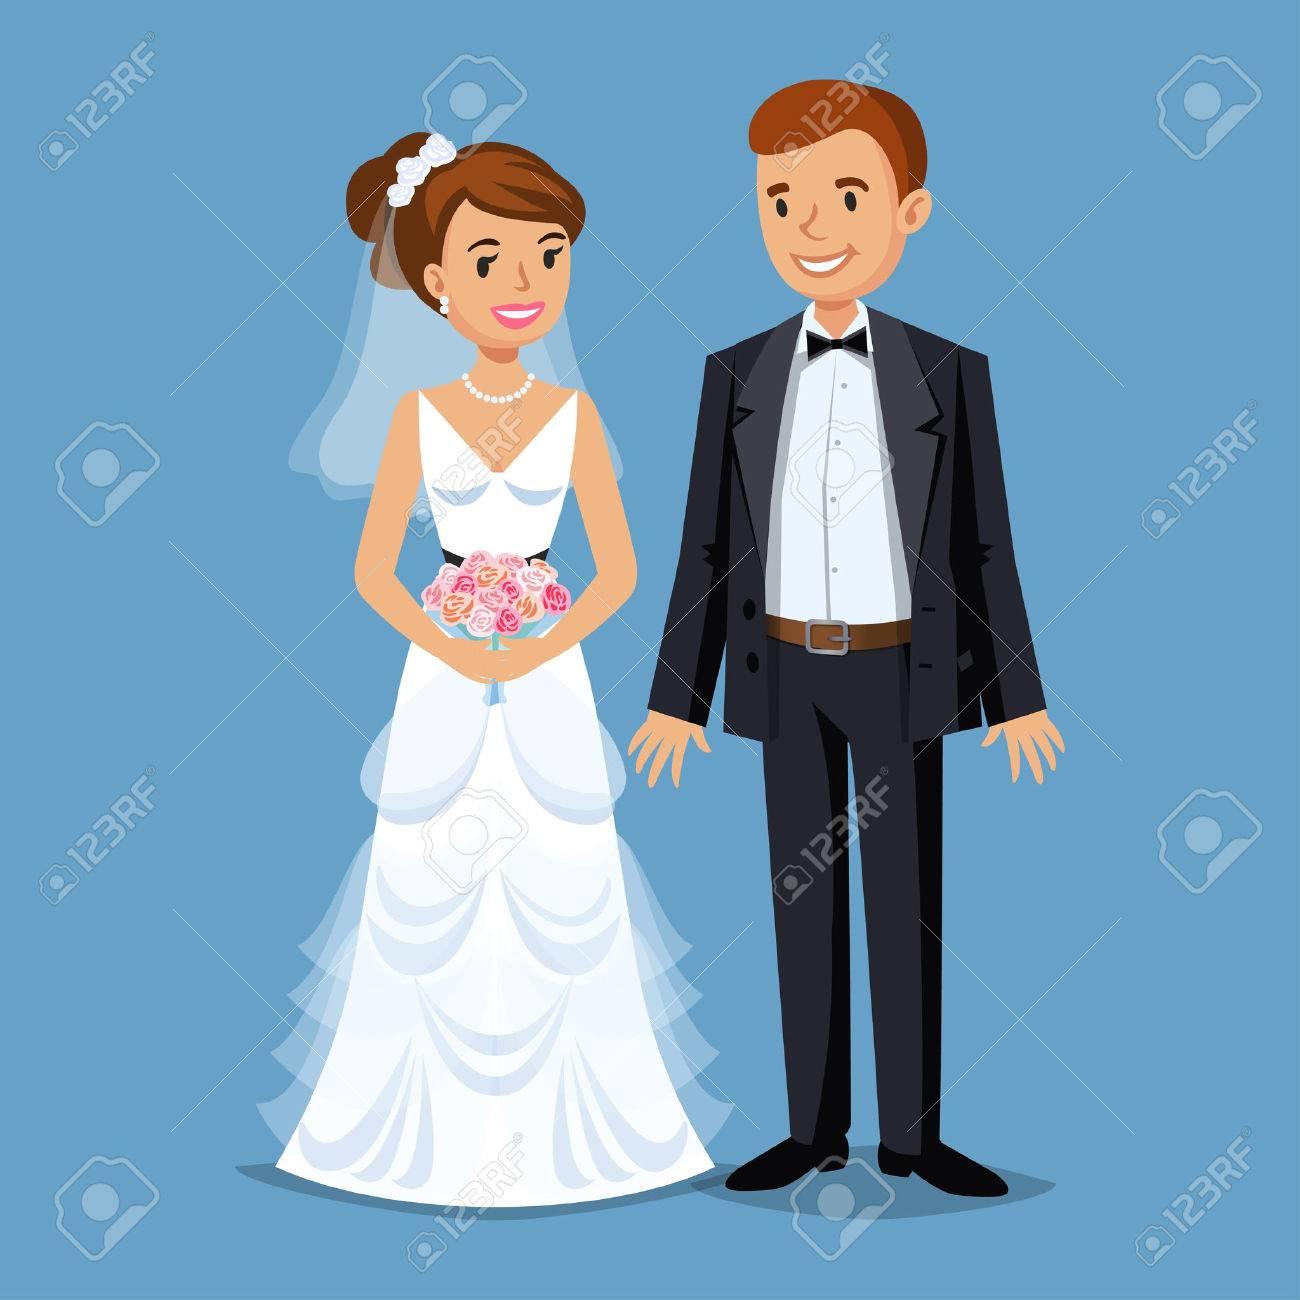 Cute Bride and groom, Wedding Party set illustration. Cartoon Wedding people couple. Vector illustration - 53256204